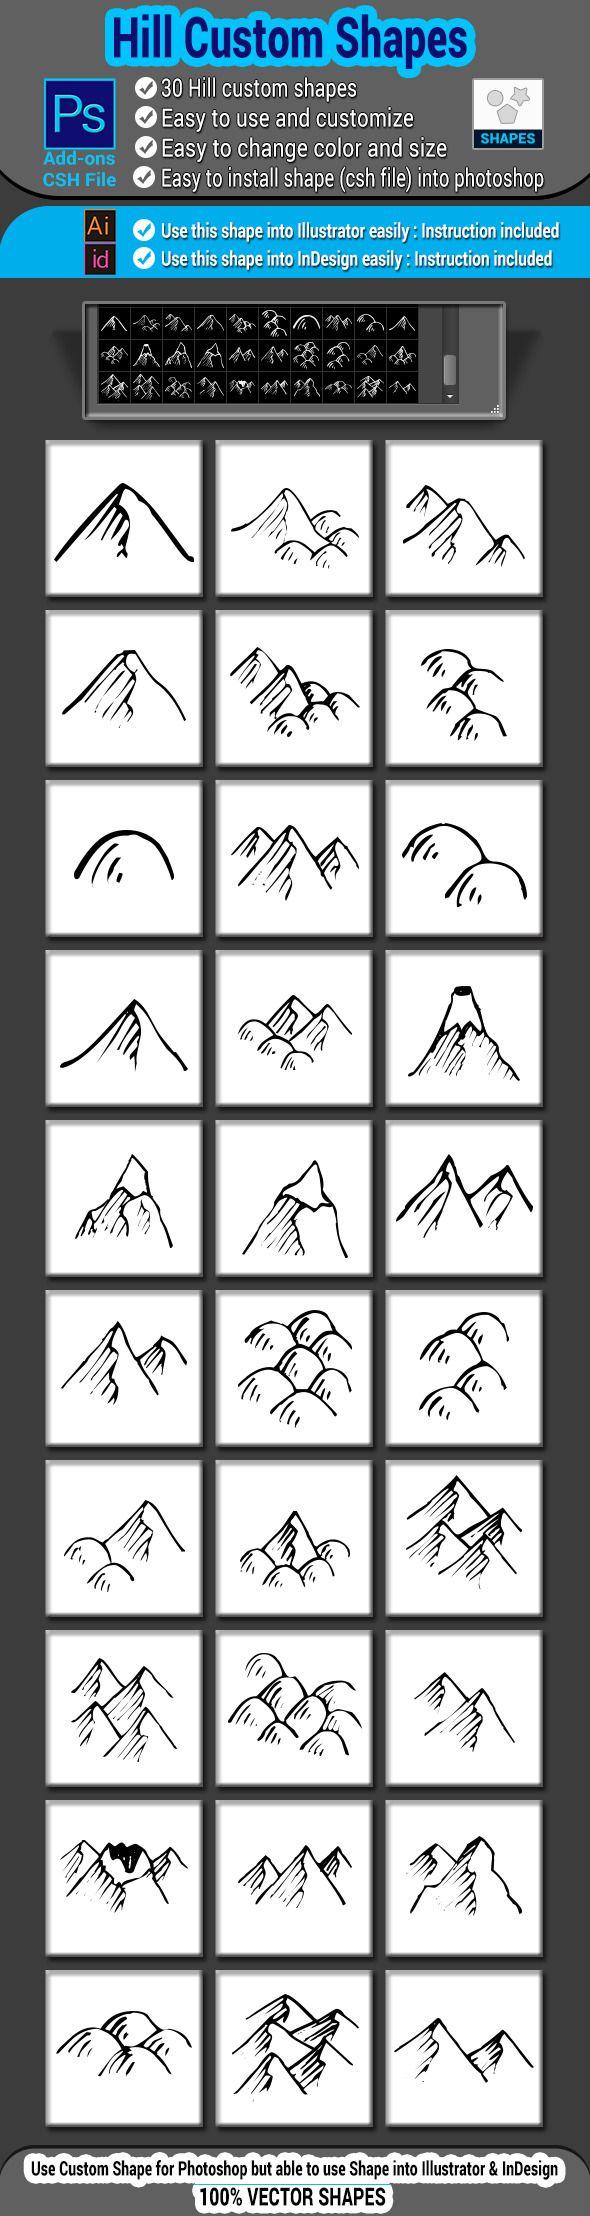 Hill Custom Shapes Custom, Photo template, Shapes